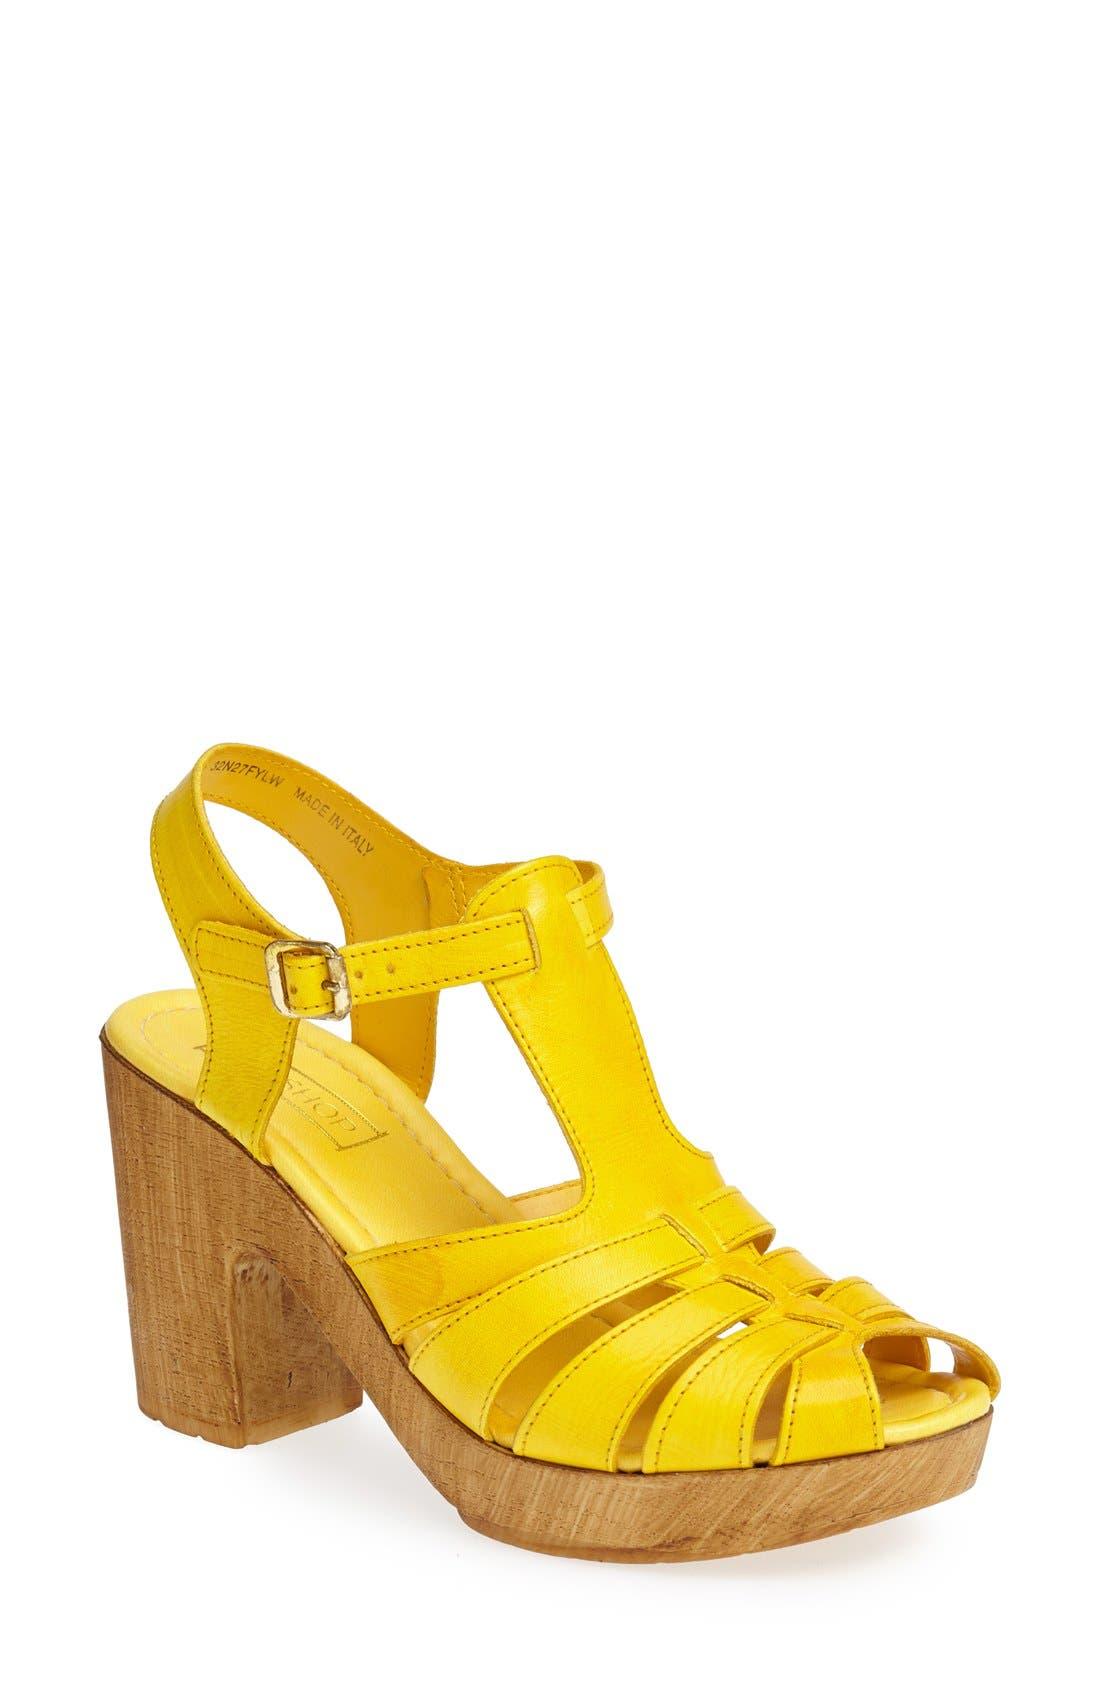 Alternate Image 1 Selected - Topshop 'Notch' Strappy Sandal (Women)